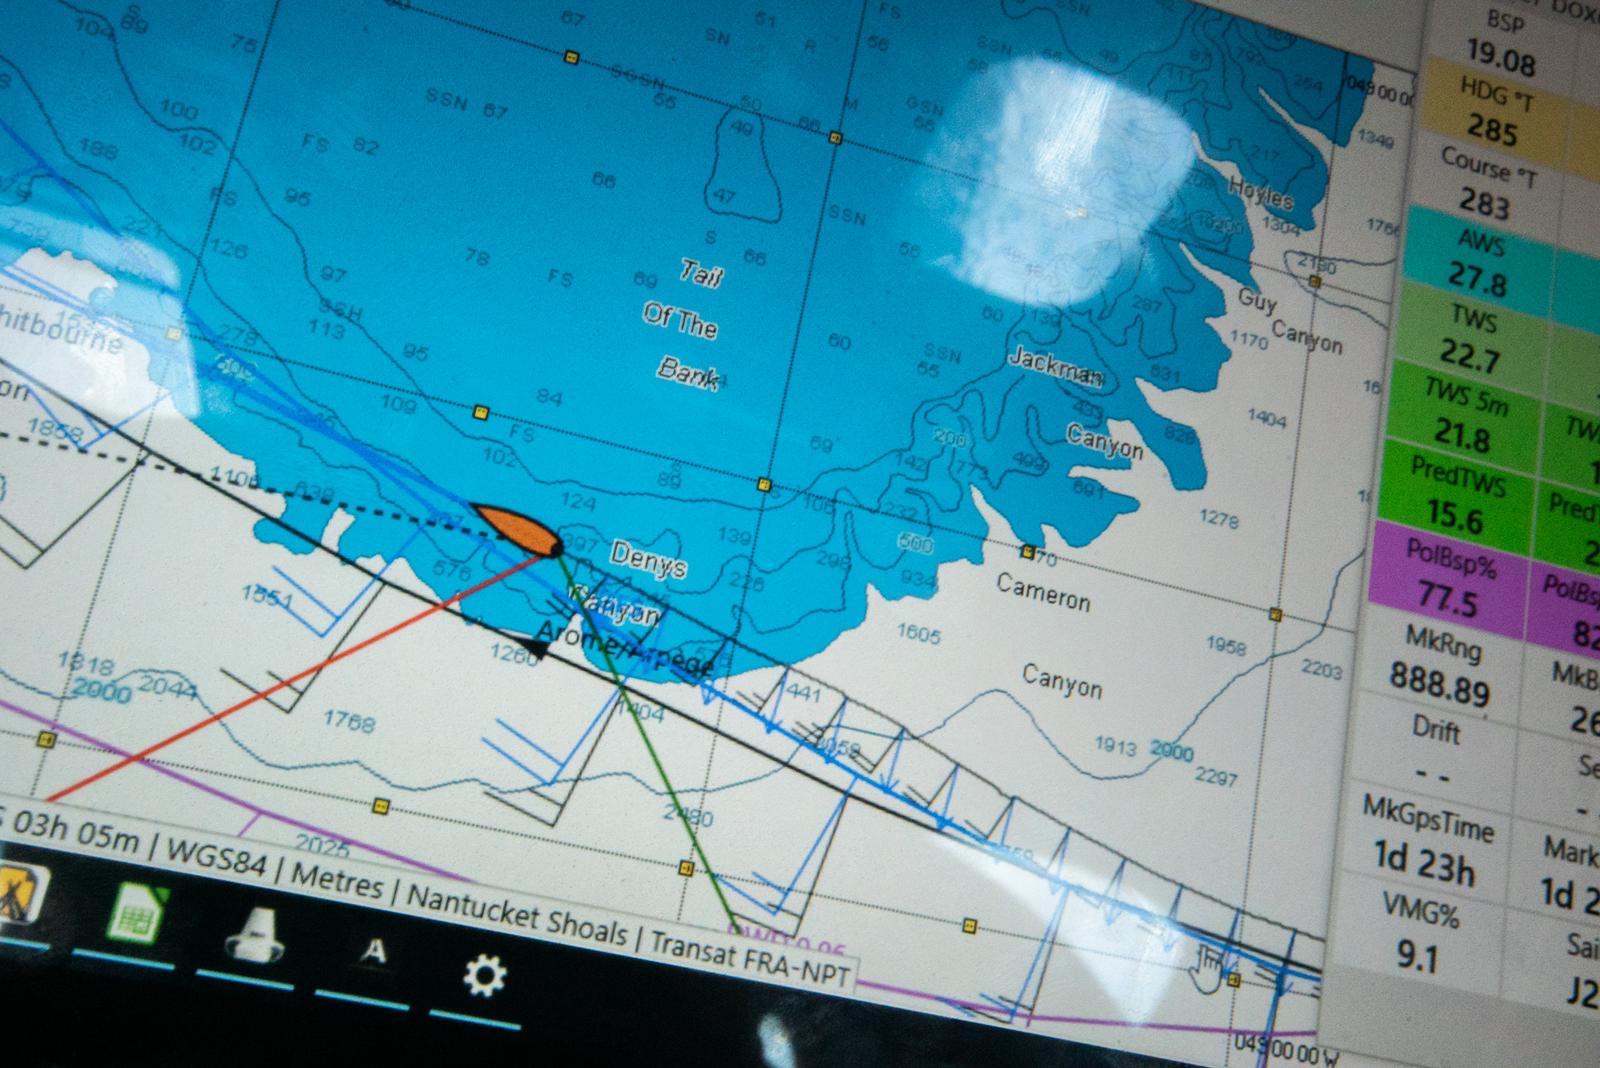 11th Hour Racing Team sail over the Newfoundland Grand Banks.